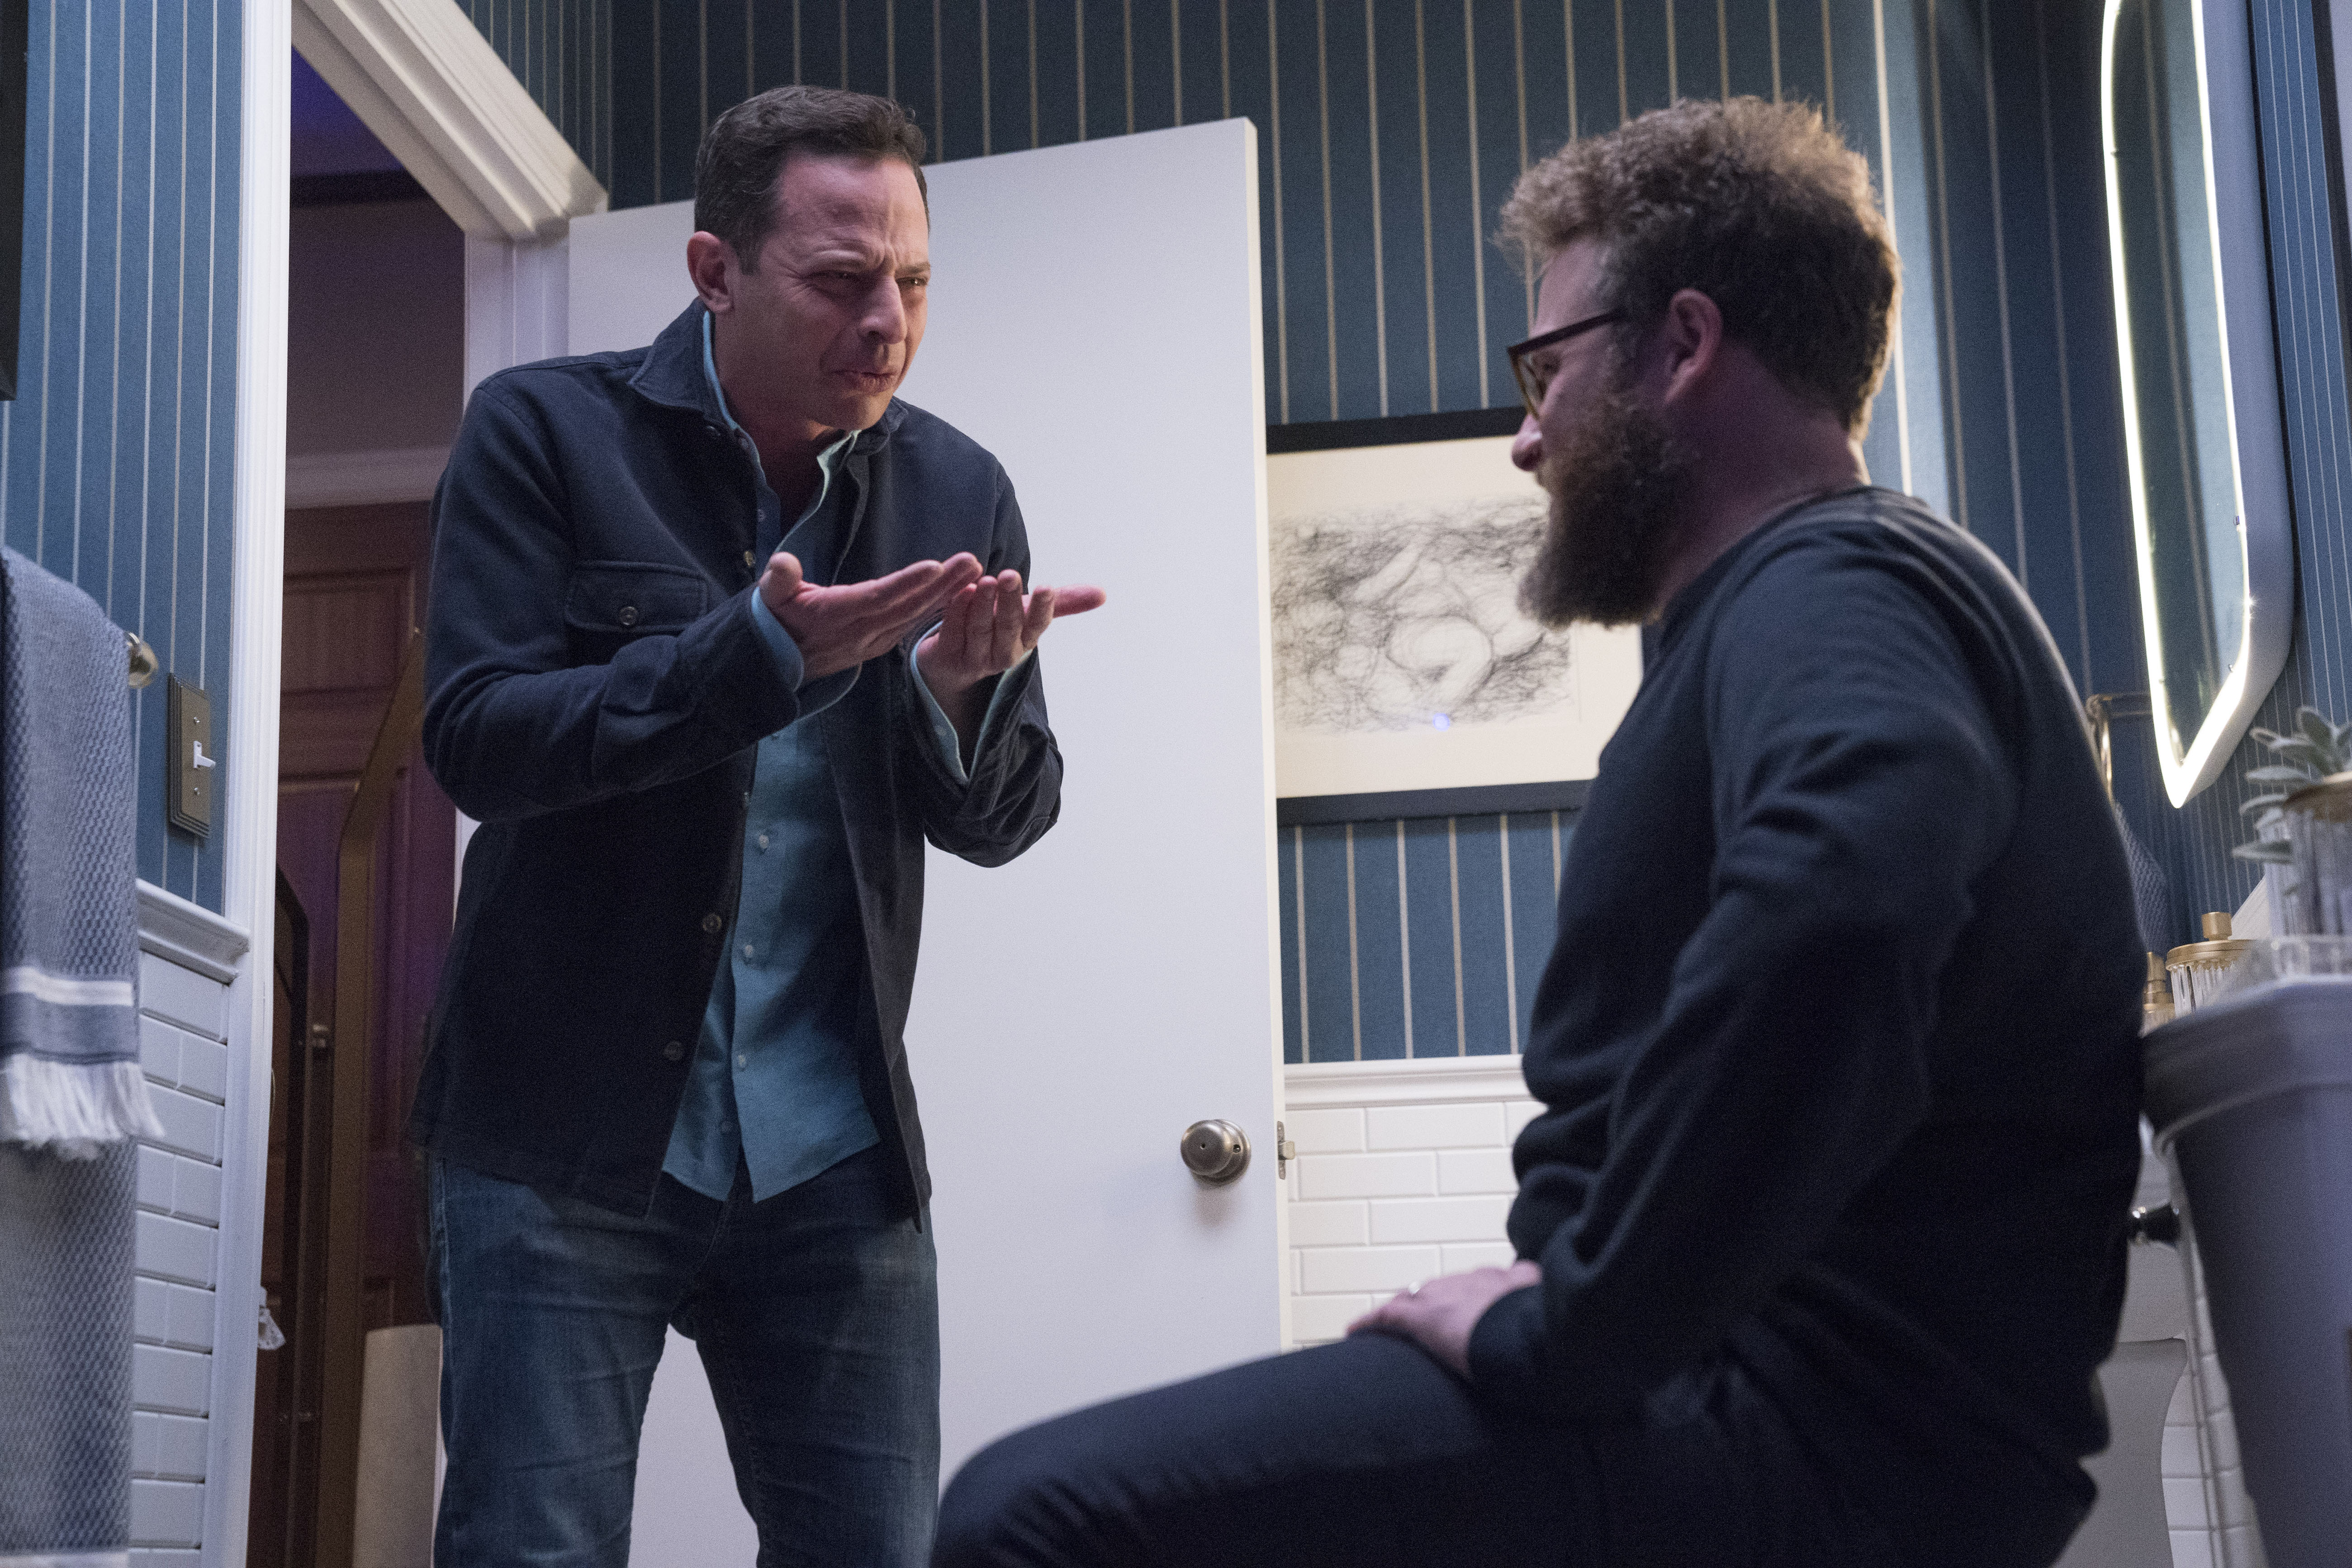 Seth Rogen on Netflix: 'Hilarity for Charity' is Sweet, Messy